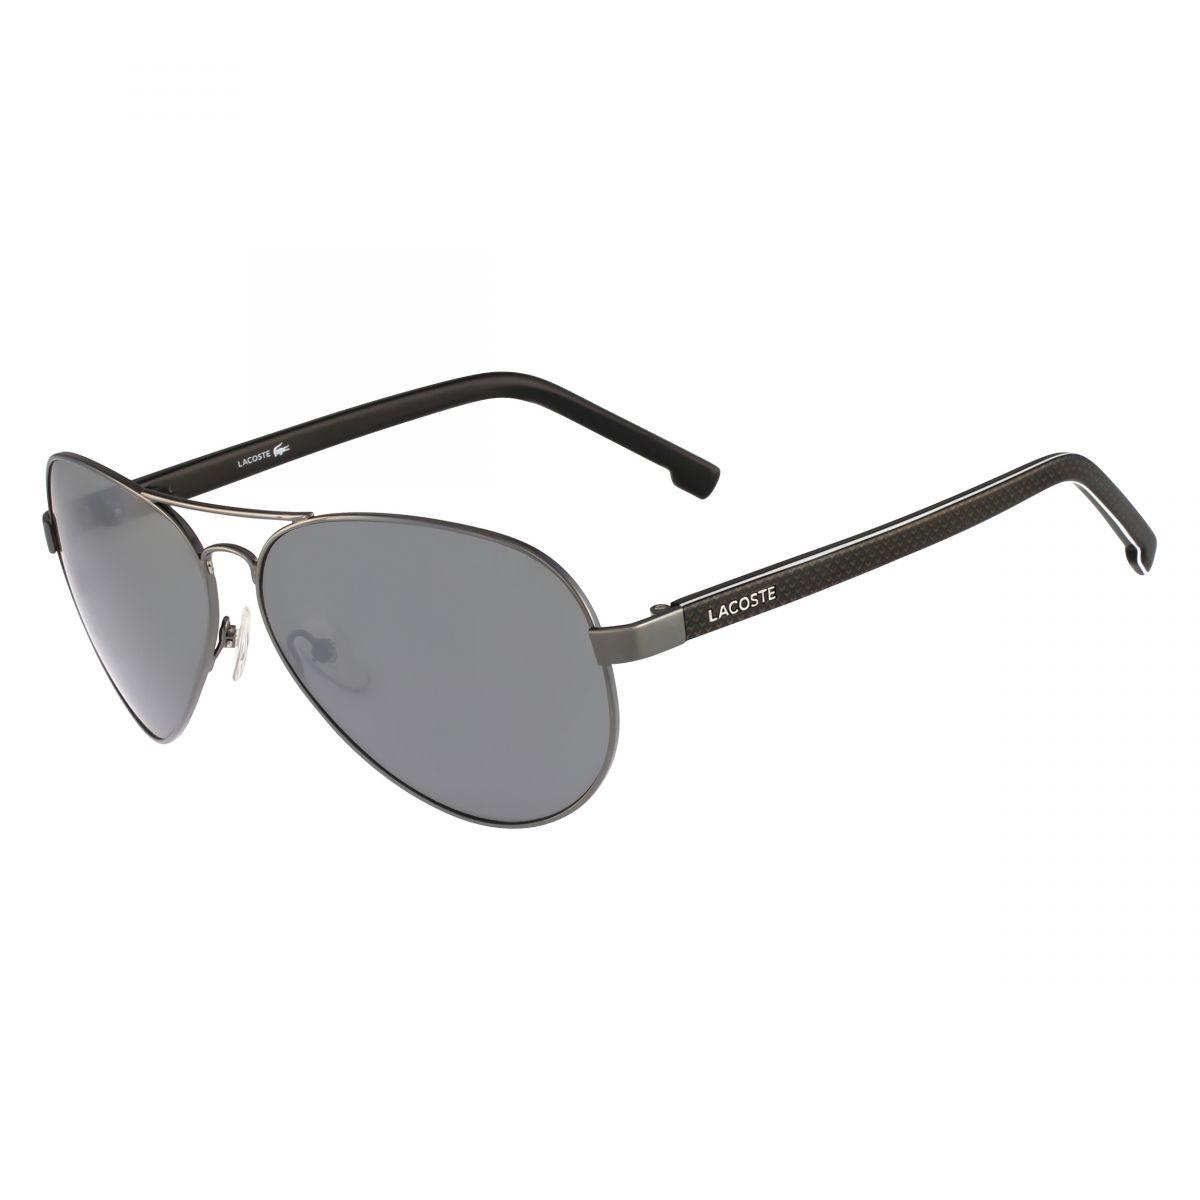 Lacoste L163S 033 62 gunmetal / grey vOt1Vm2c